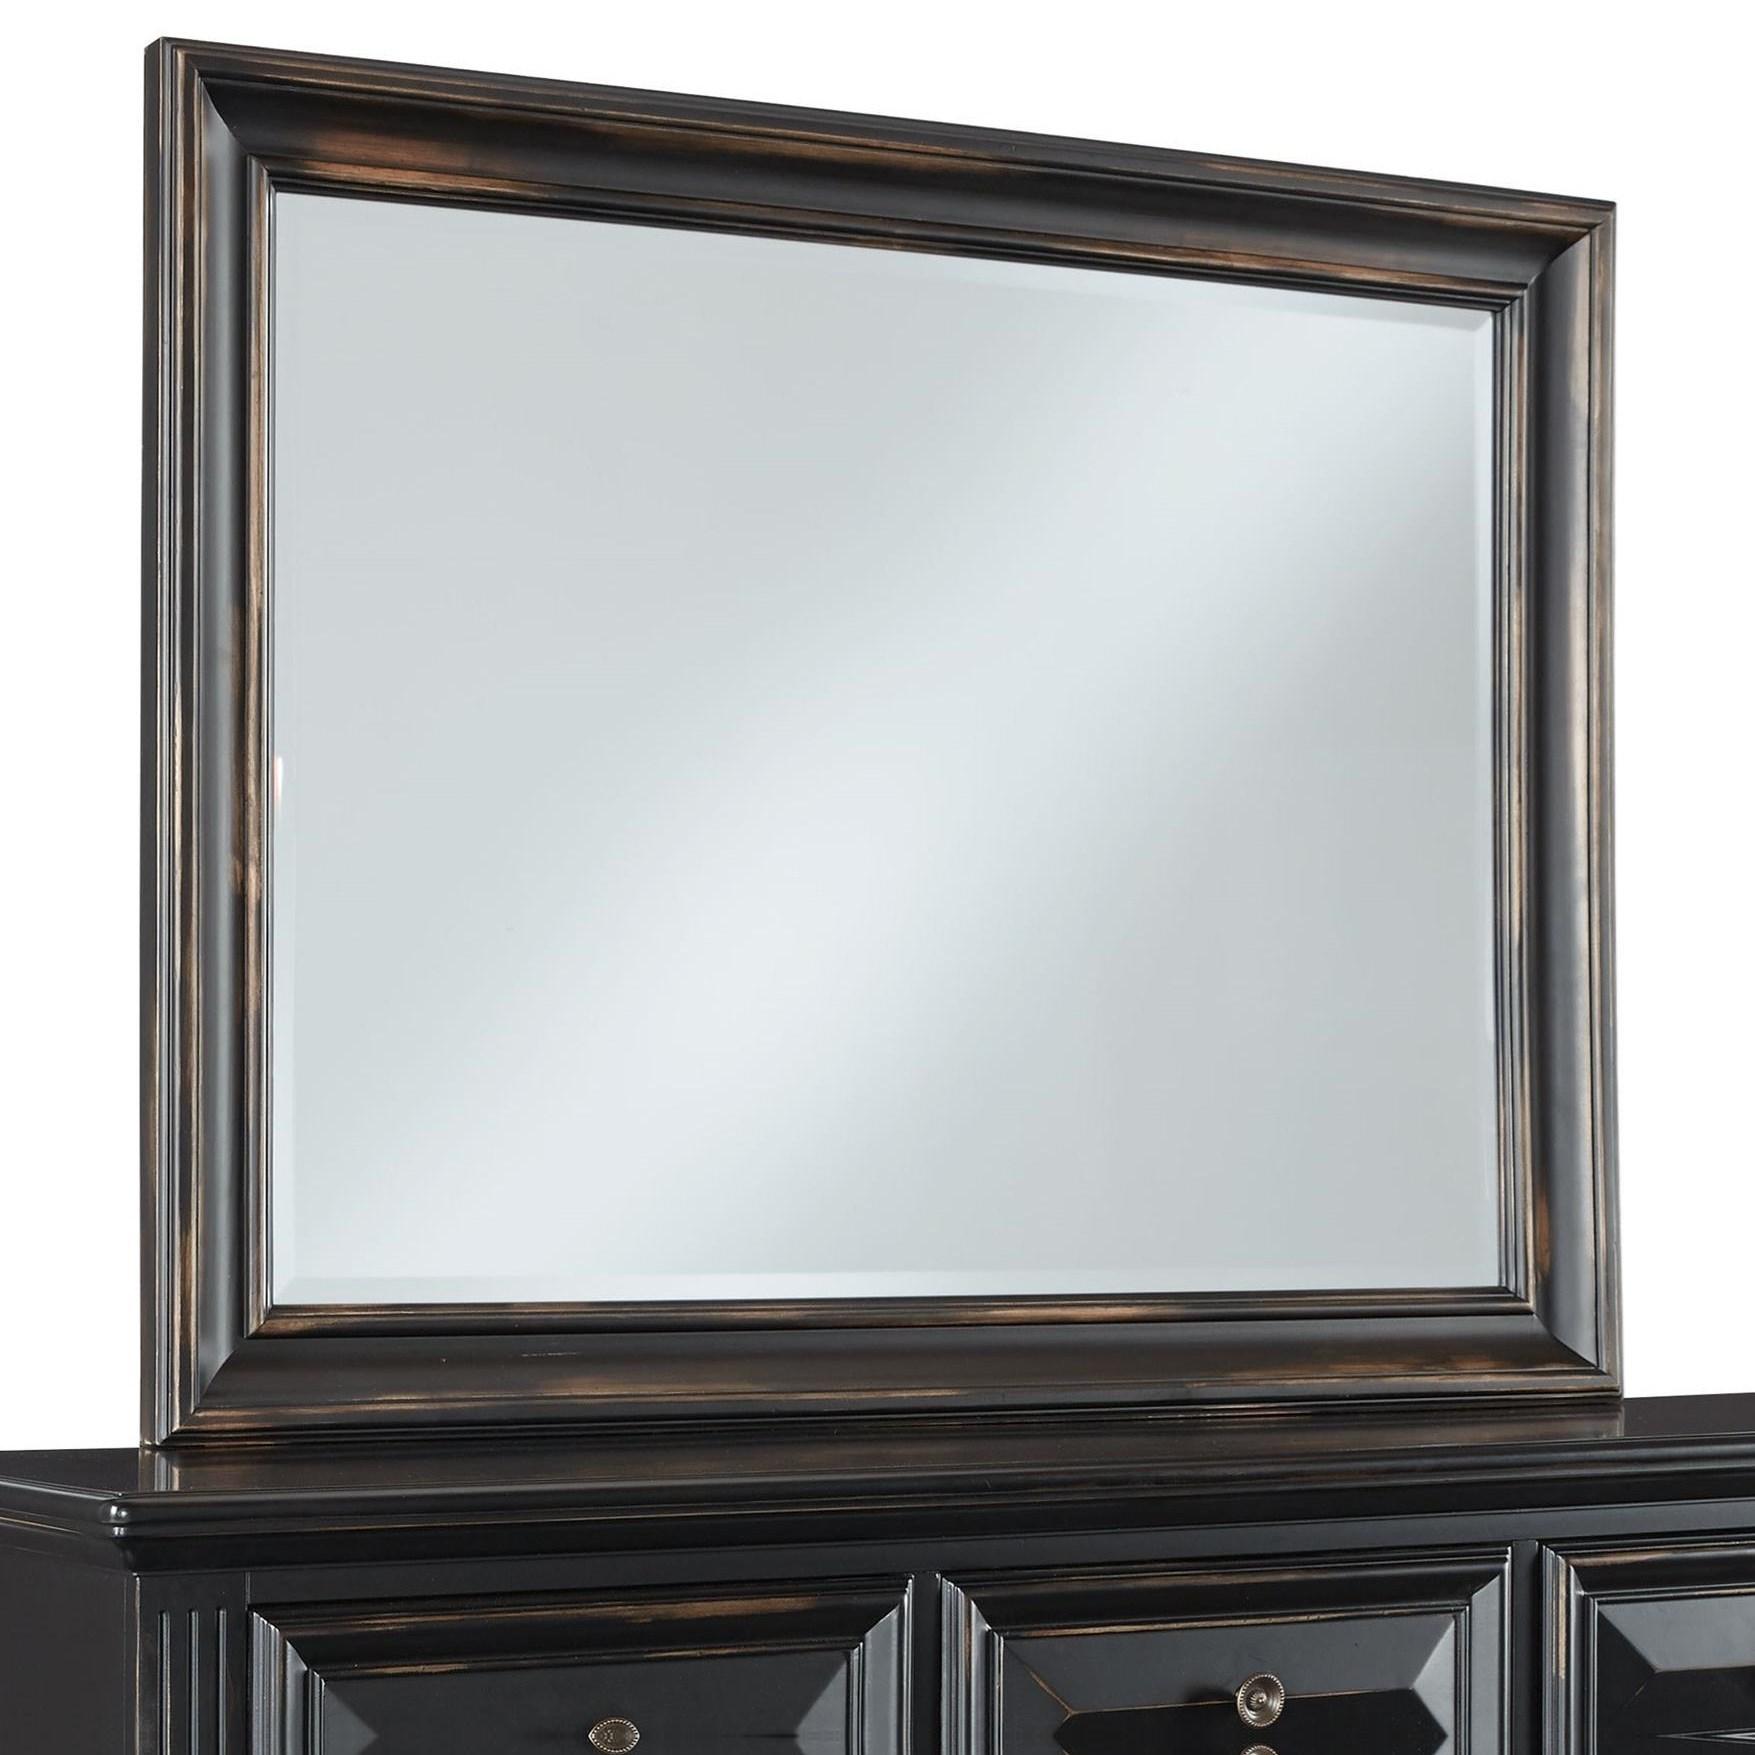 Standard Furniture Passages Mirror - Item Number: 86908